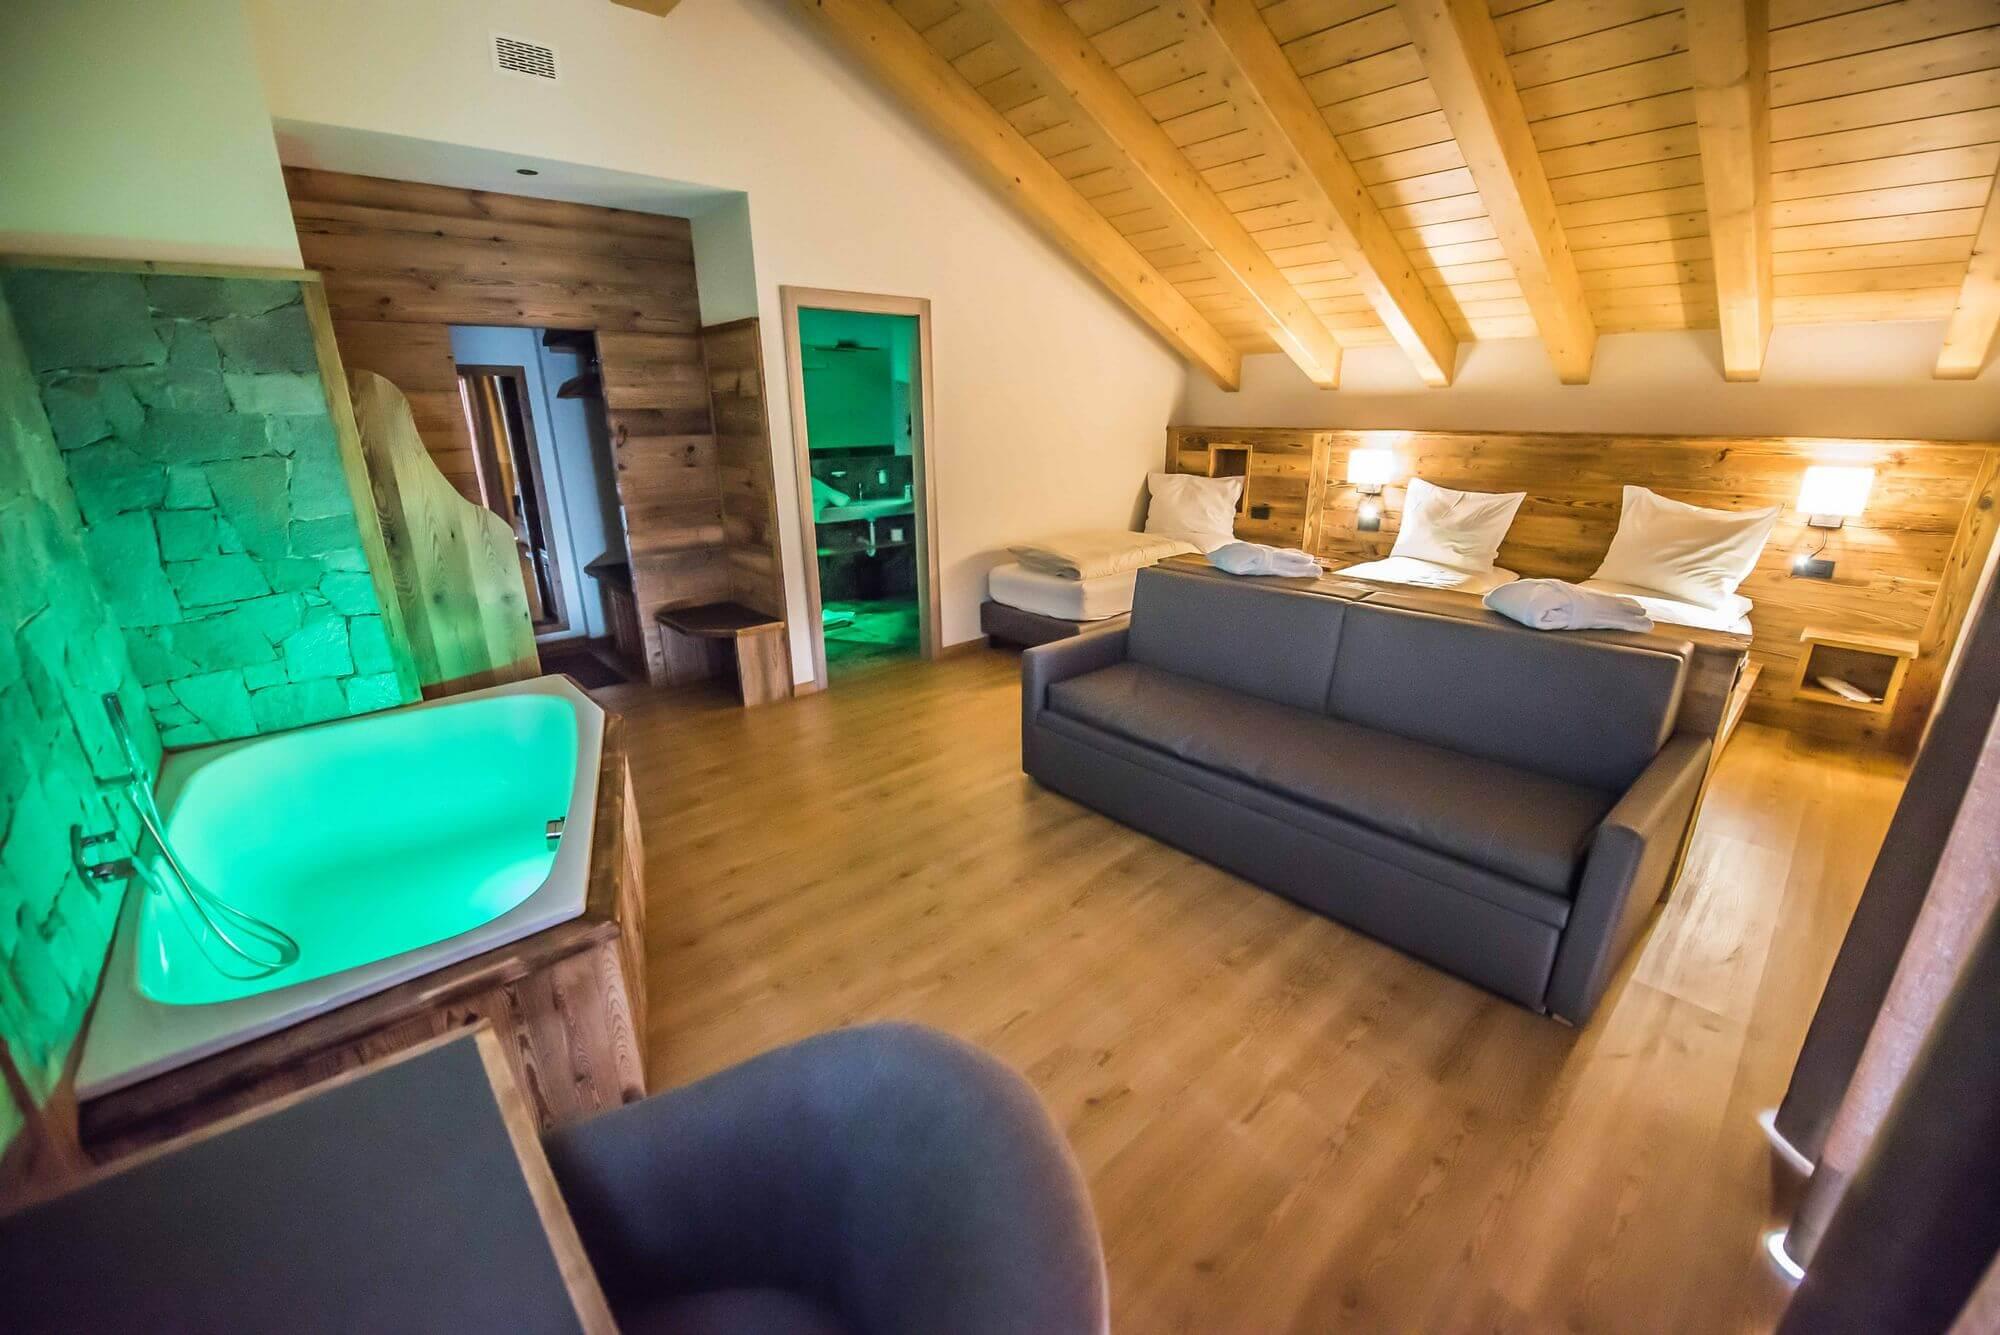 Bellissima suite con tutti i comfort: Hotel Le Alpi